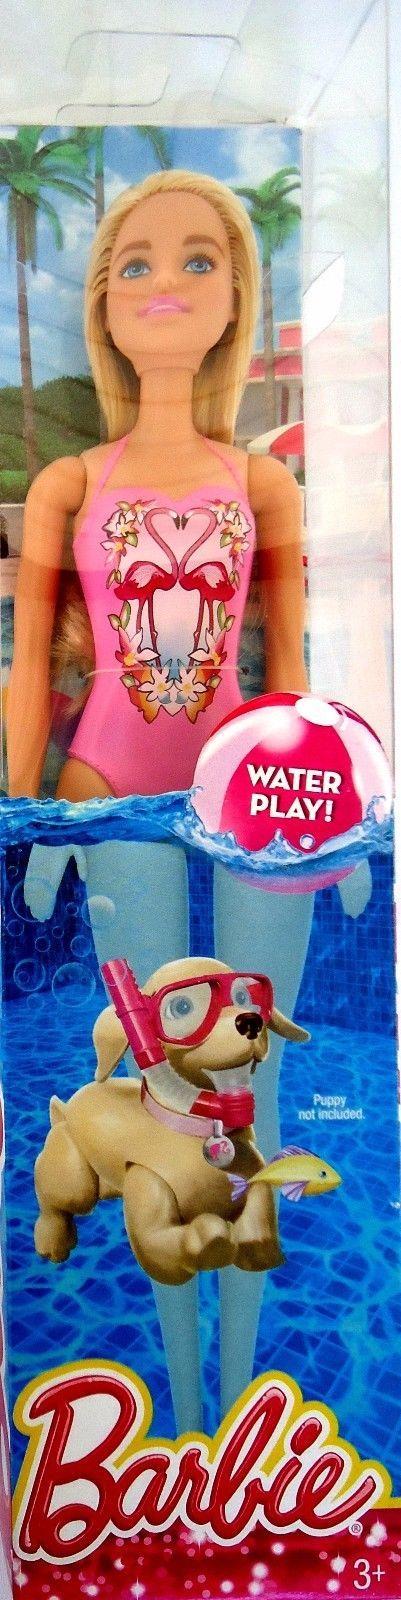 2016 Barbie Doll Water Play DGT78 Mattel (as seen on 2016 Glam Pool Box) Pink Flamingo Swimsuit NRFB   eBay